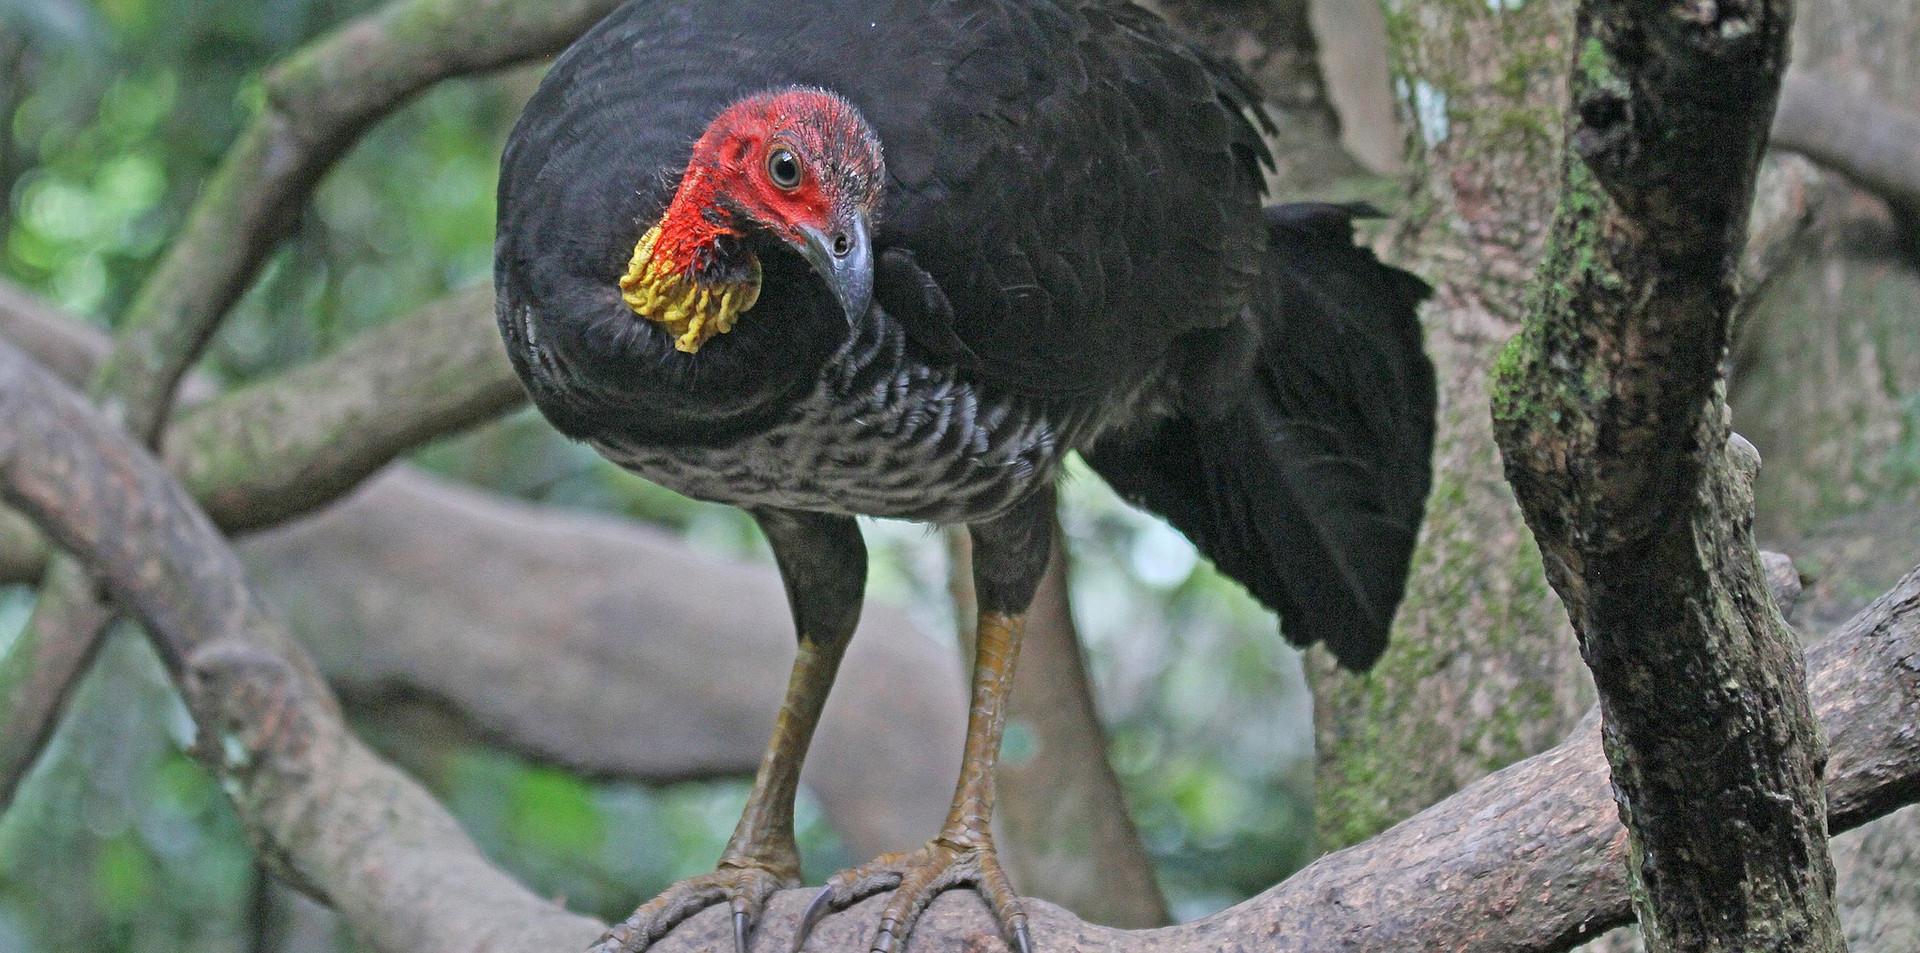 Adult Australian Brush-turkey in tree